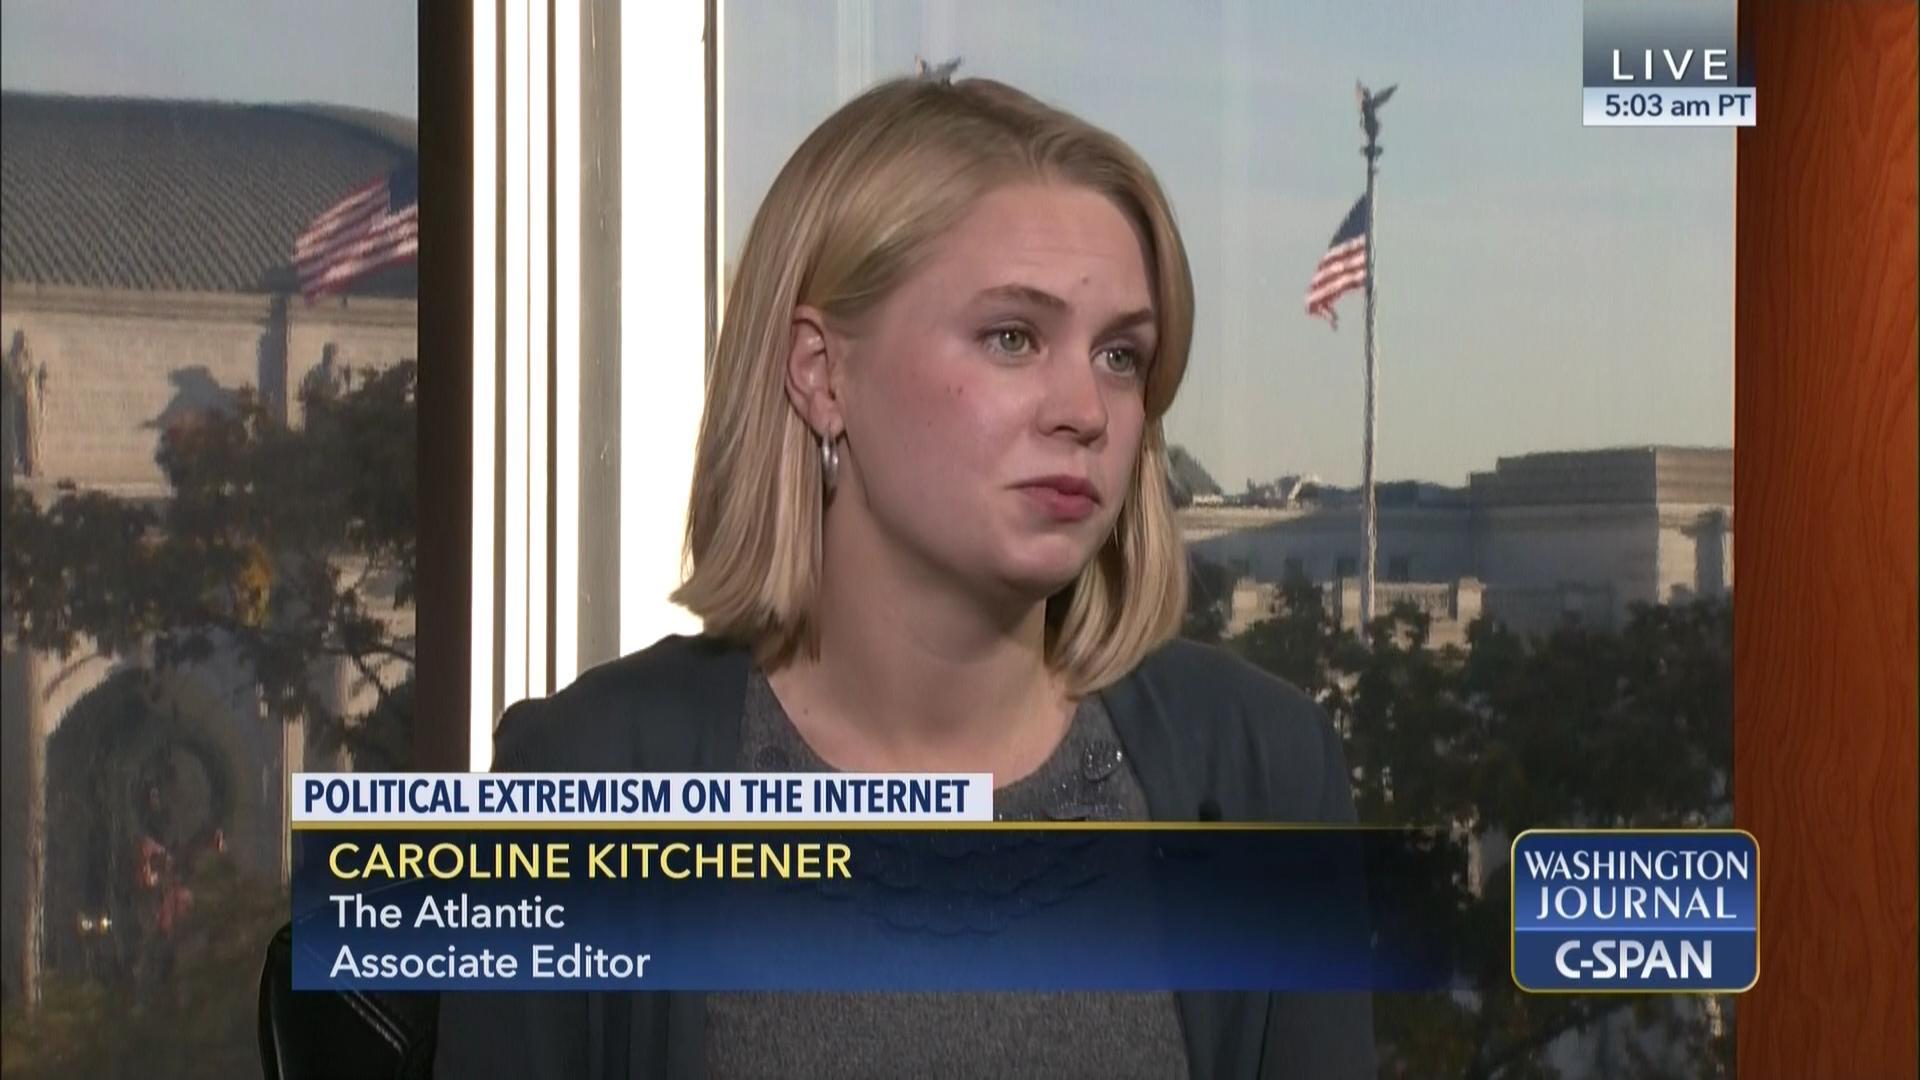 Washington Journal Caroline Kitchener Discusses Political Extremism ...